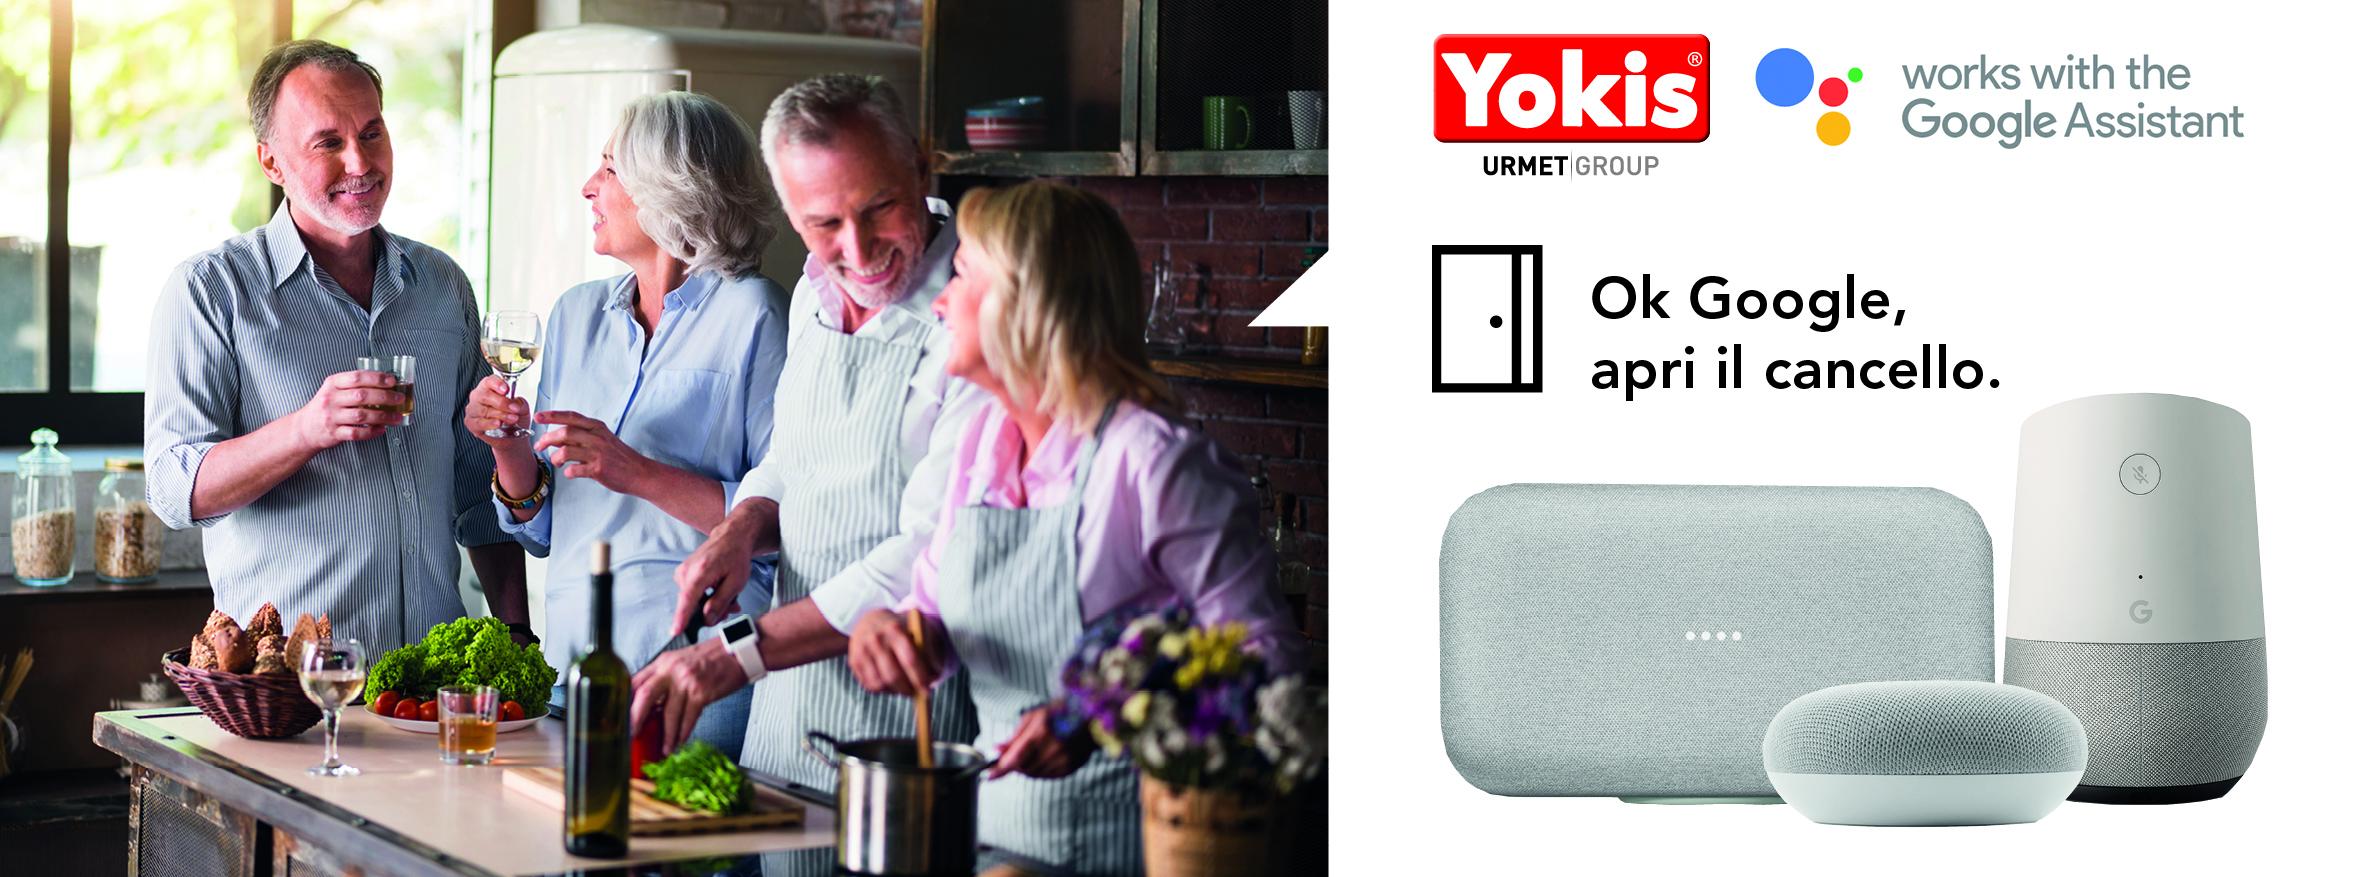 Schemi Elettrici Urmet : Assistente vocale urmet più comfort per la casa con yokis e